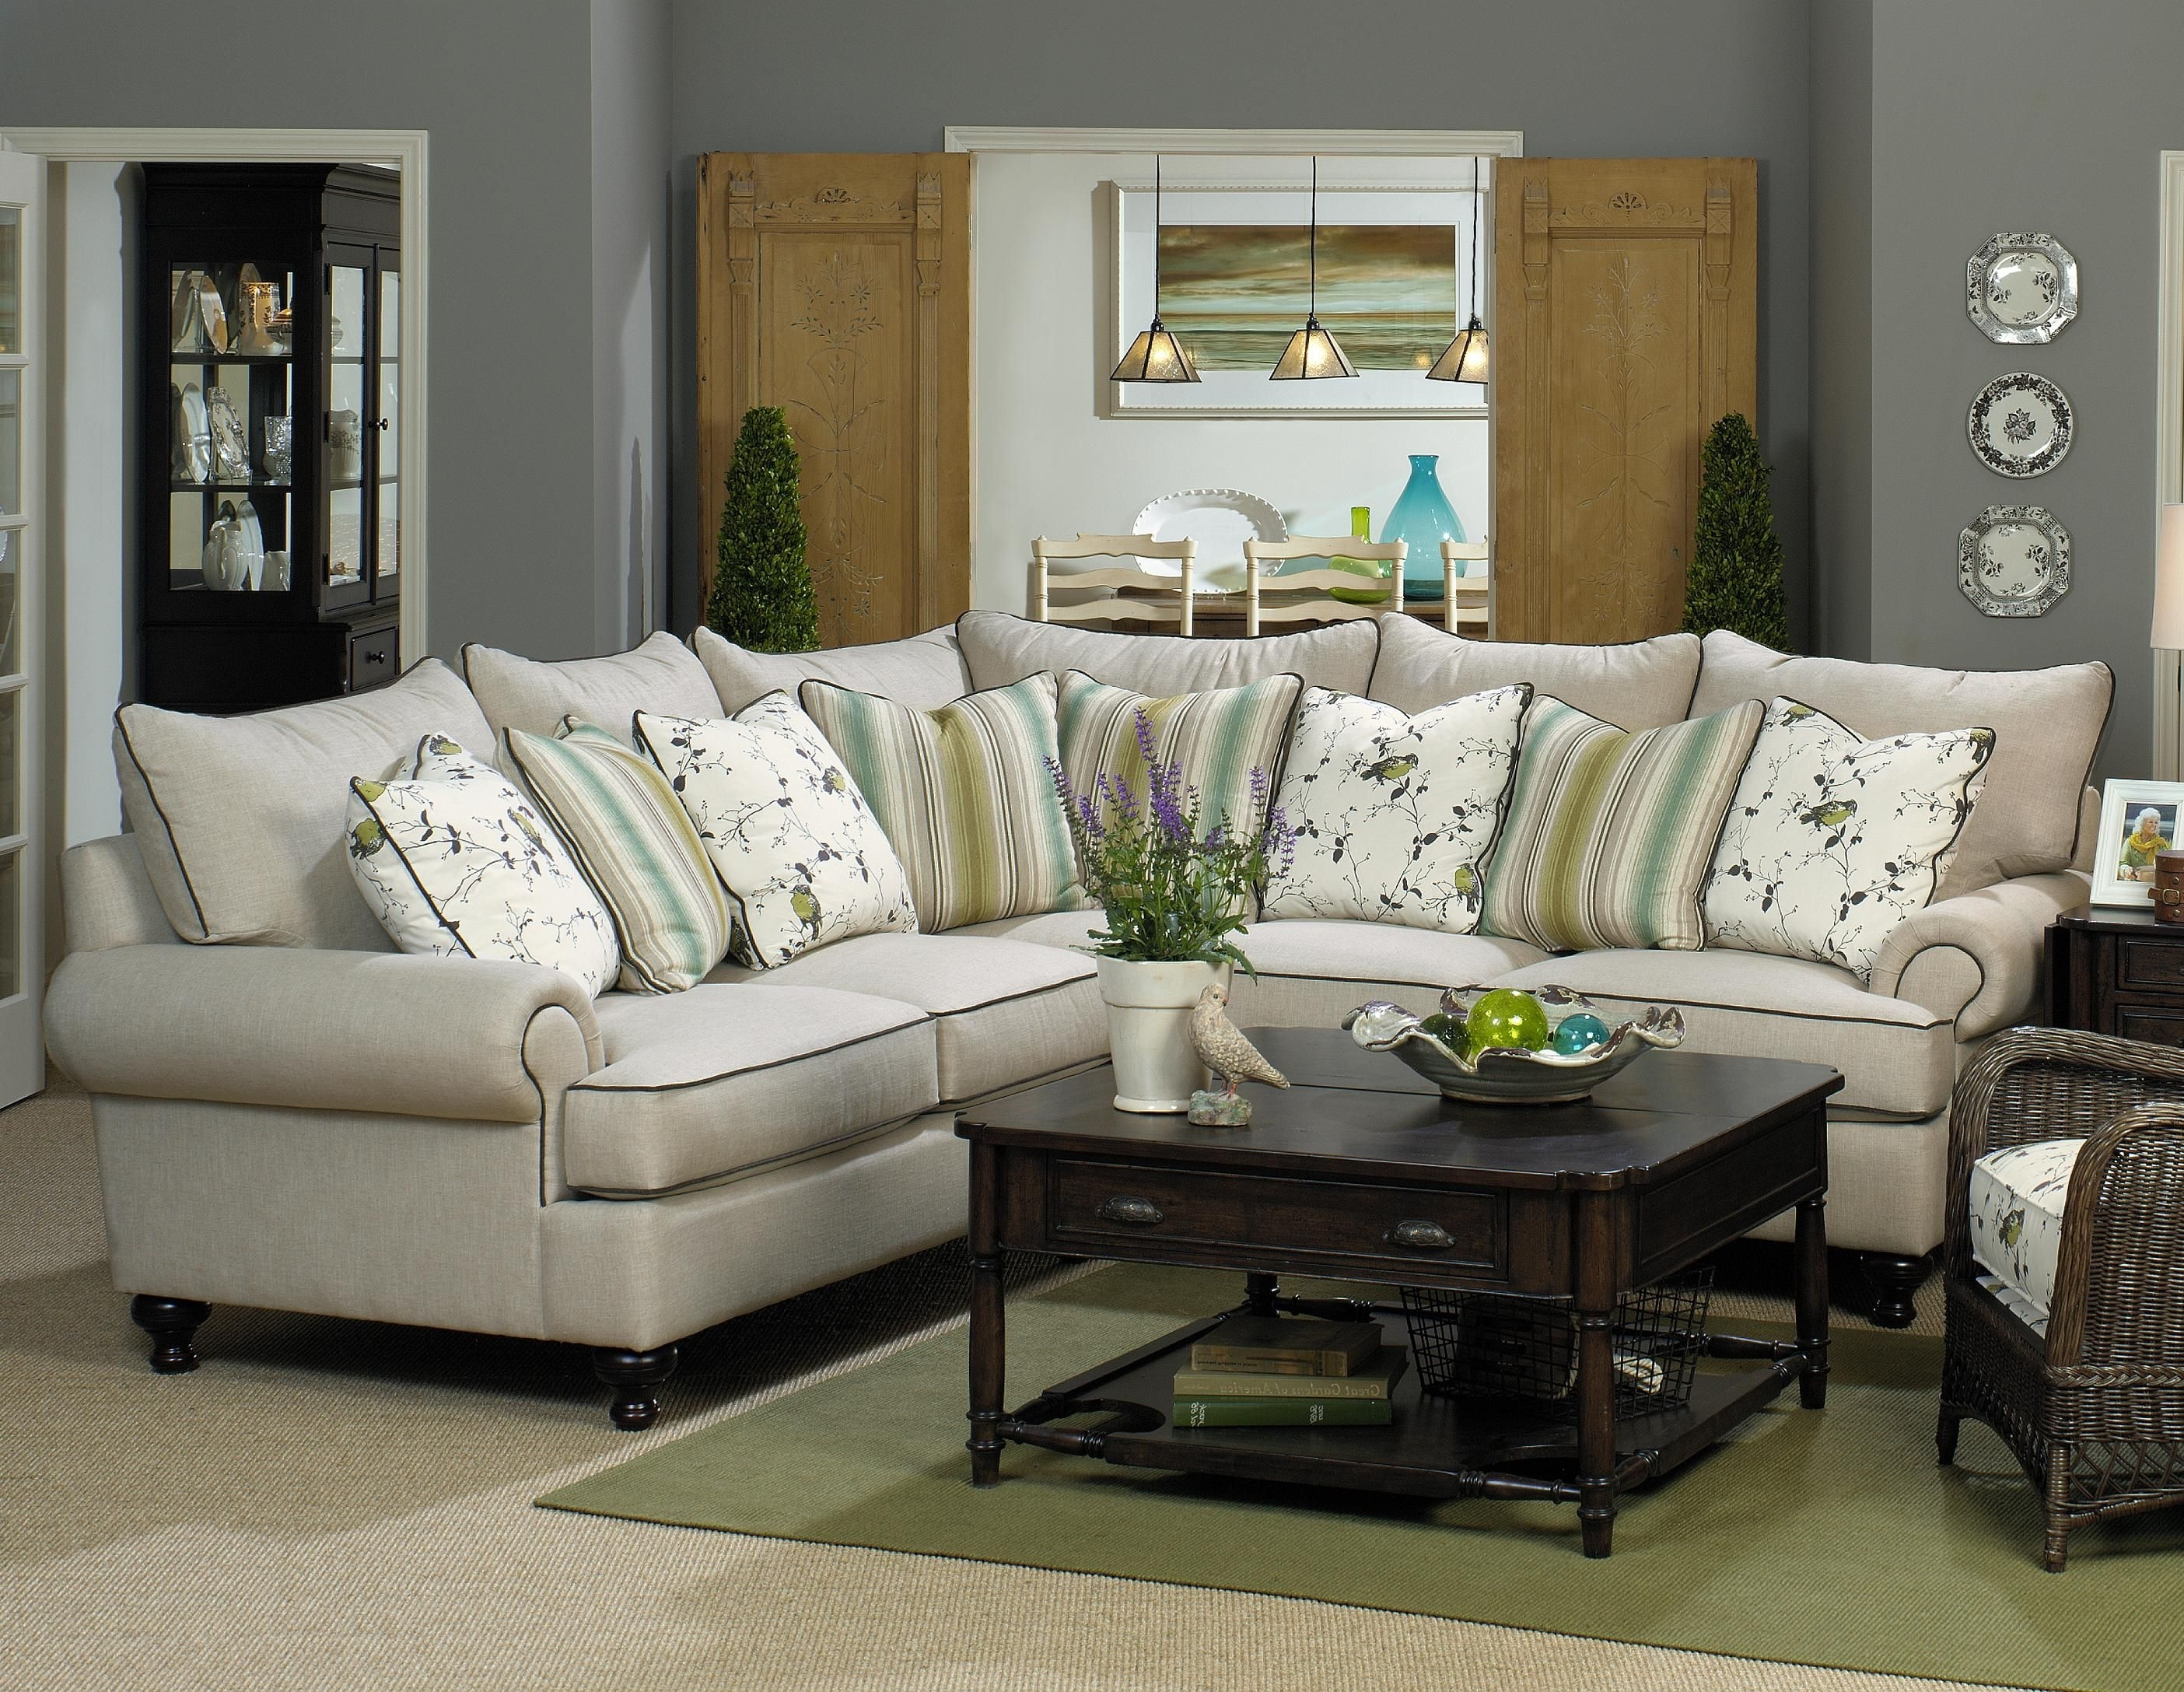 Paula Deen Home 2 Piece Sectional Sofapaula Deenuniversal Inside Recent Pensacola Fl Sectional Sofas (View 9 of 20)